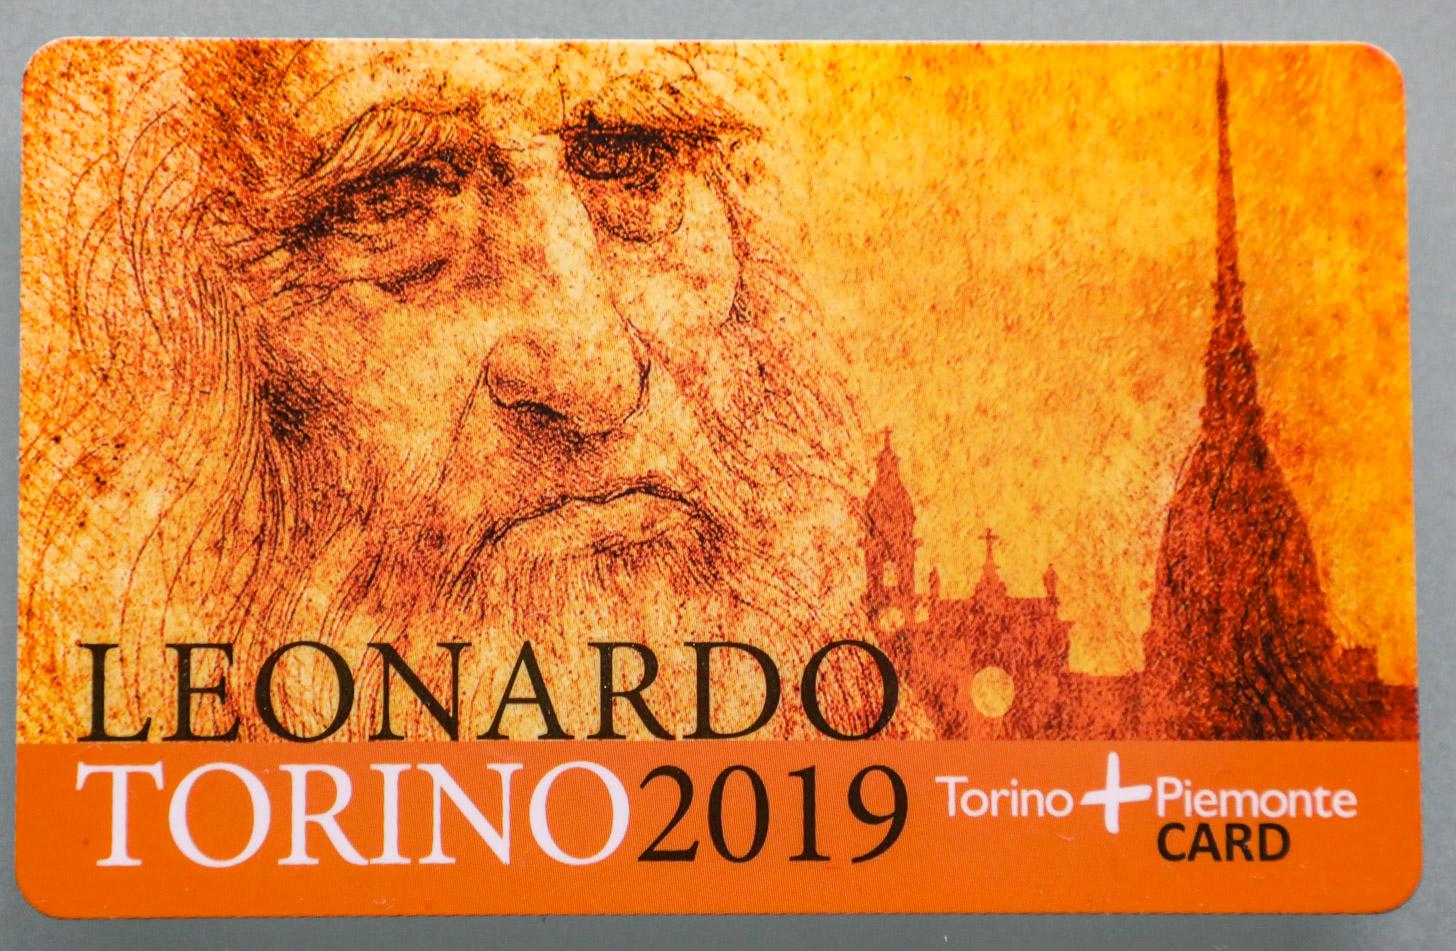 Torino-Piemonte Card